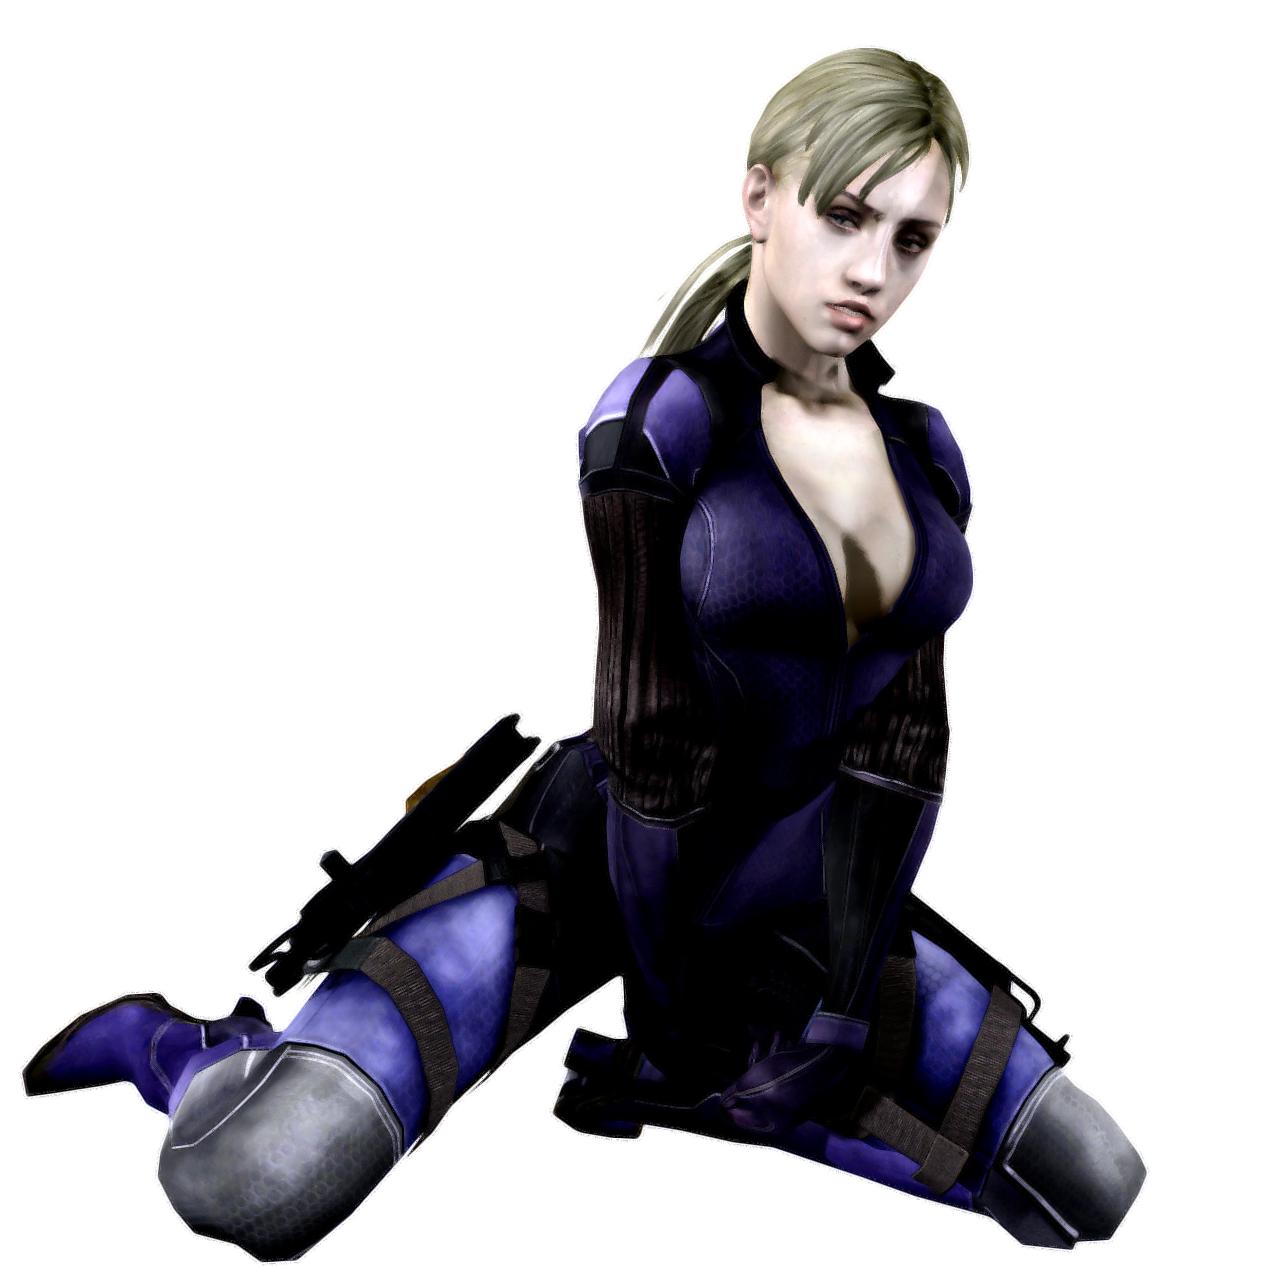 Battlesuit Jill Valentine 9 by LordHayabusa357